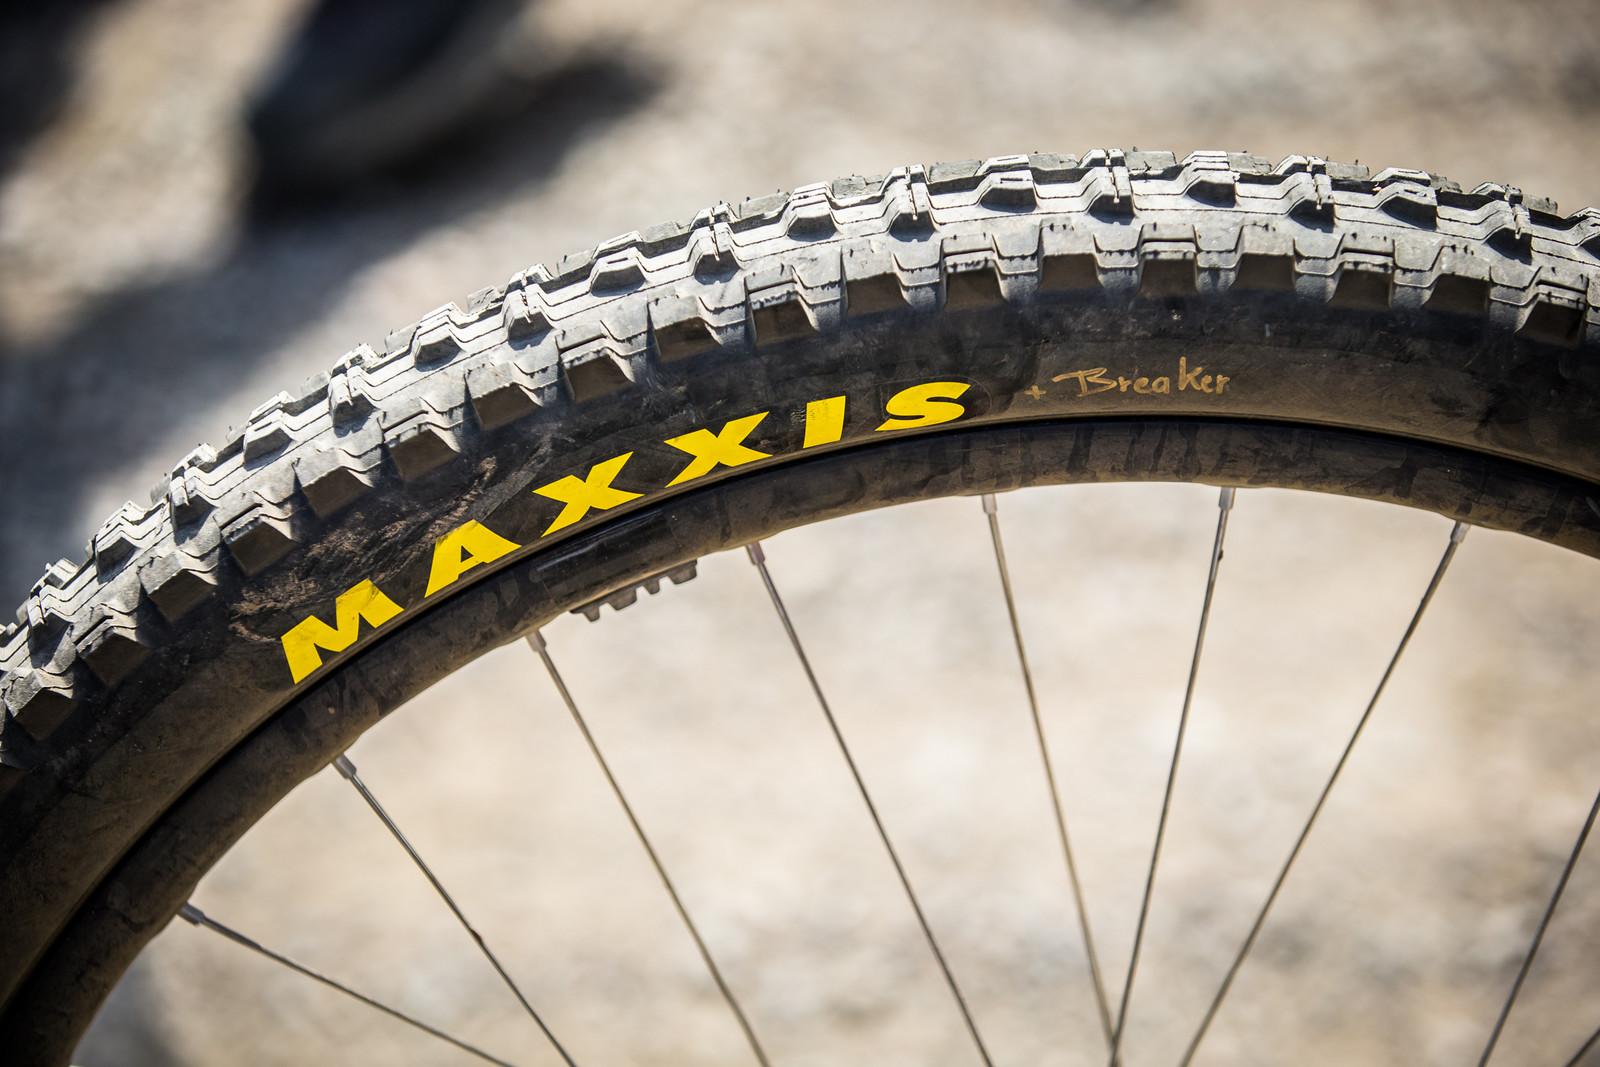 Maxxis Minion DHR II Rear Tire with Breaker Construction - WINNING BIKE - Loris Vergier's Santa Cruz V10cc 29 - Mountain Biking Pictures - Vital MTB